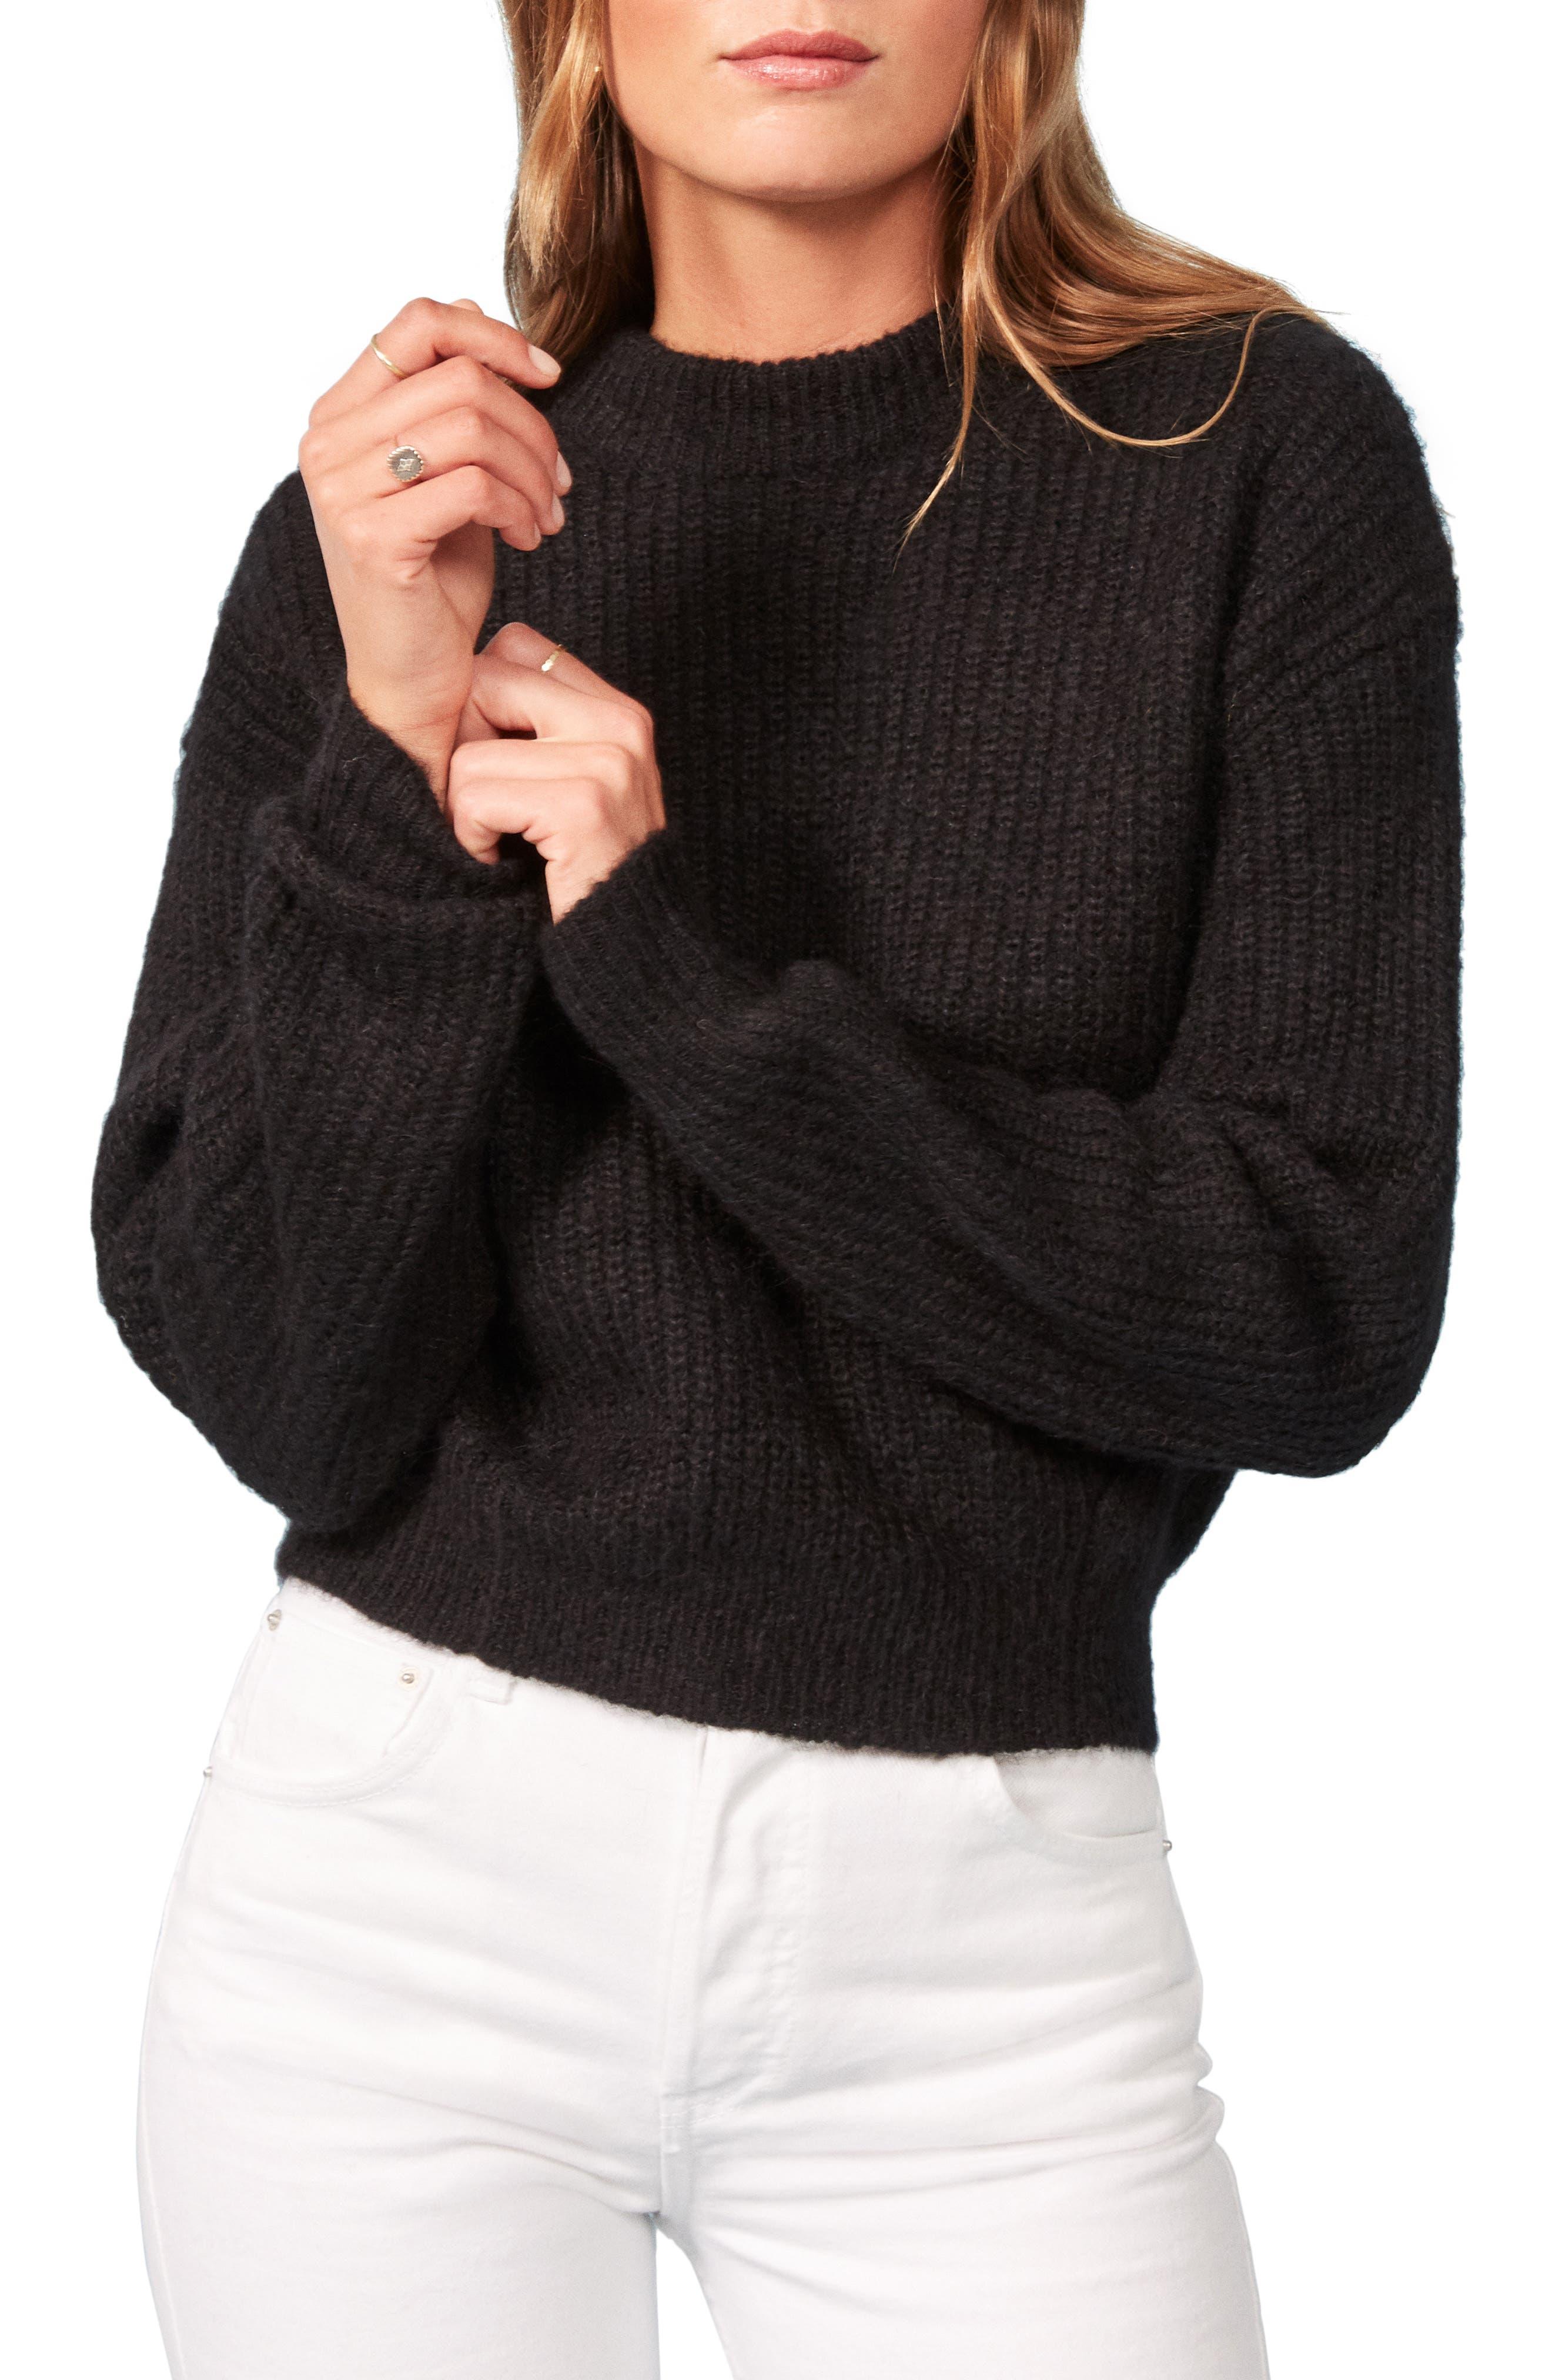 Finn Sweater,                             Main thumbnail 1, color,                             BLACK